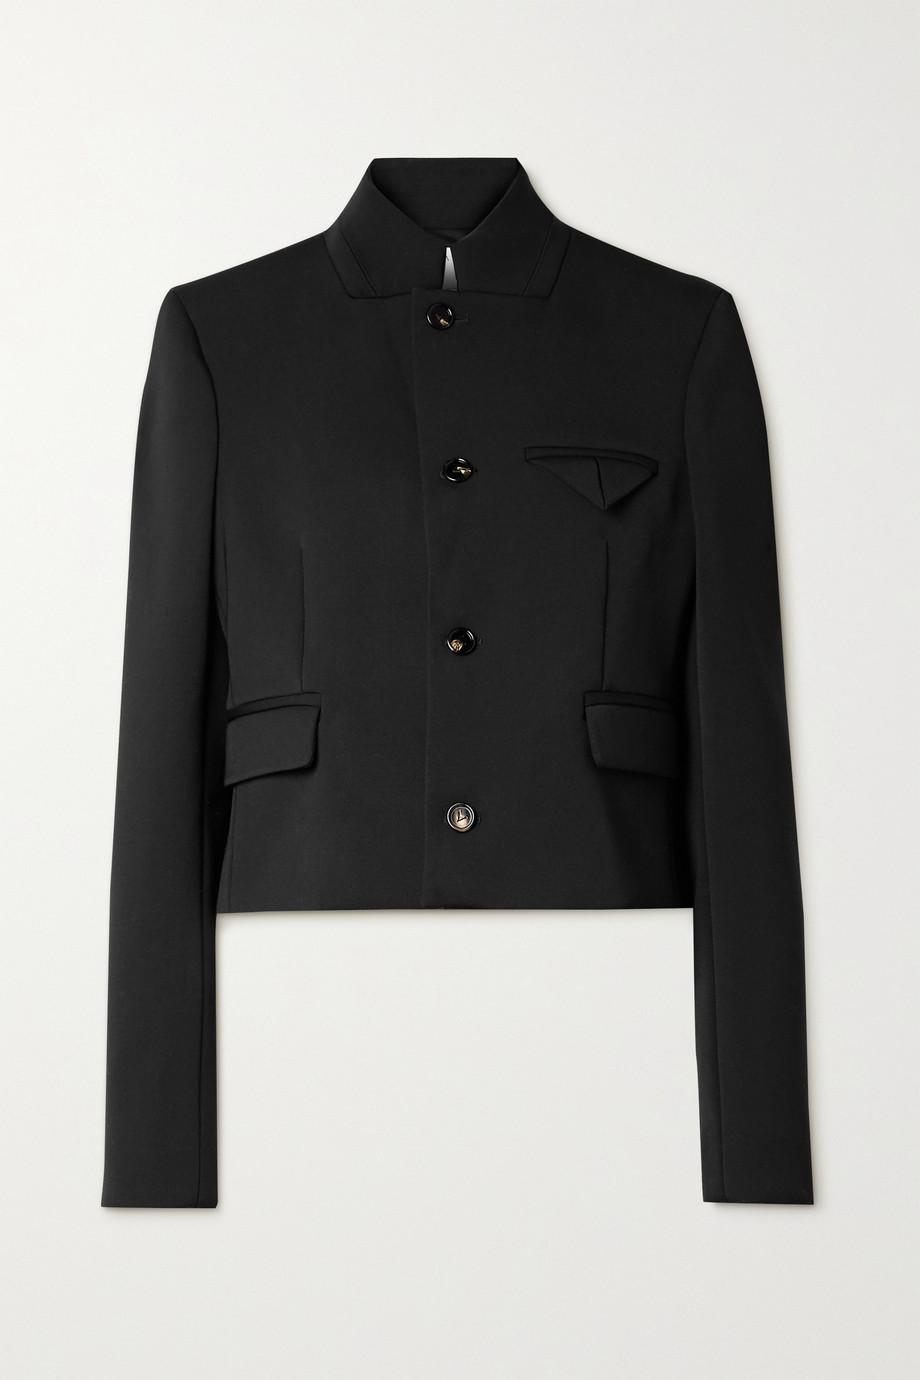 Bottega Veneta Cropped wool-blend twill jacket